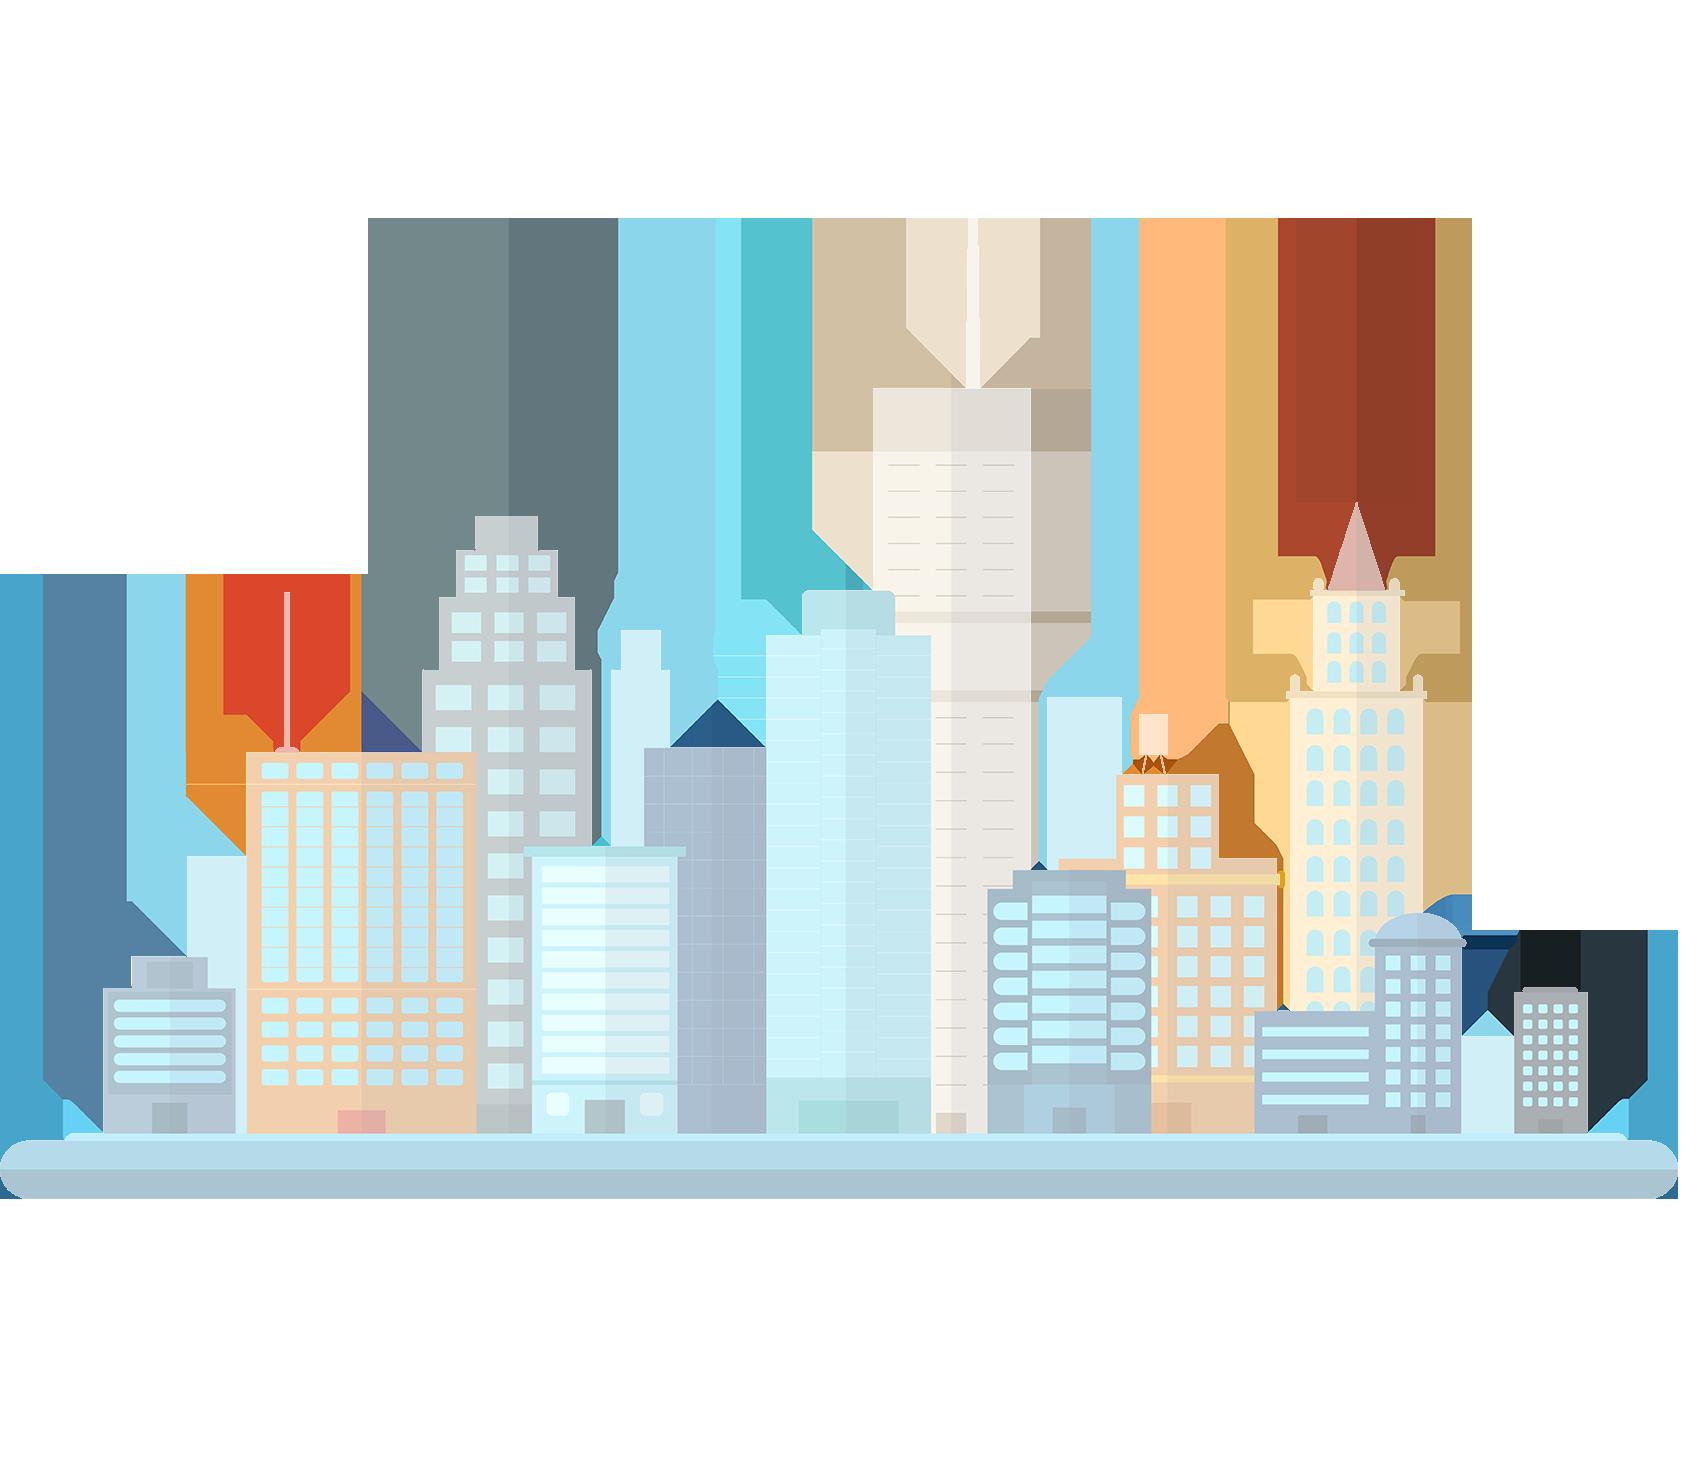 City clipart metropolitan area. Building cityscape clip art